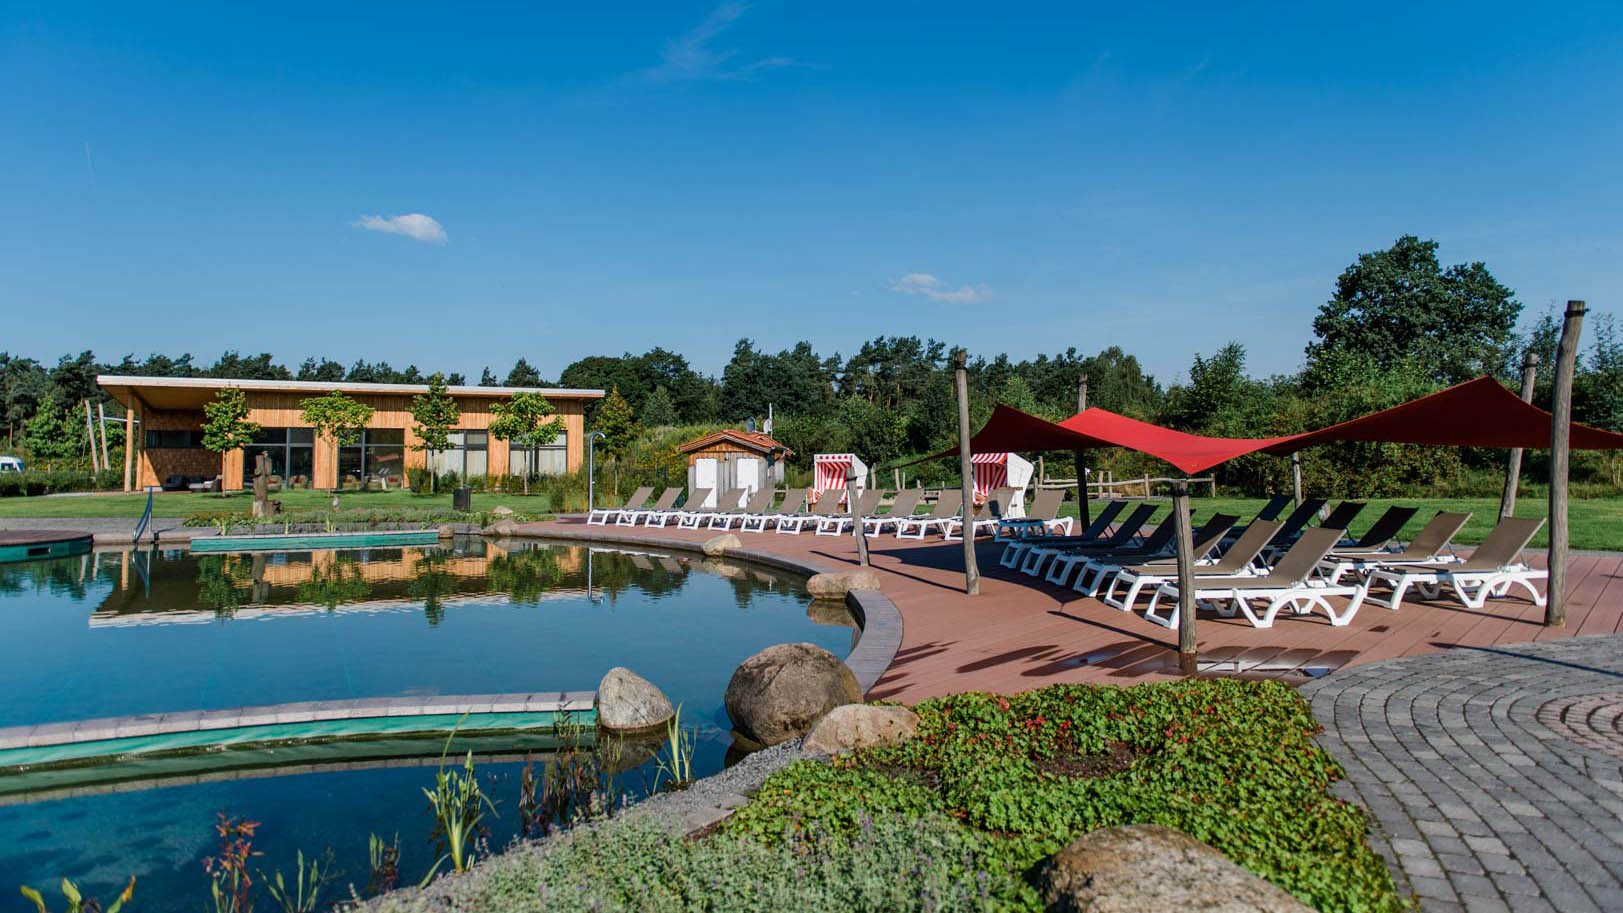 campingpark-suedheide-naturschwimmteich